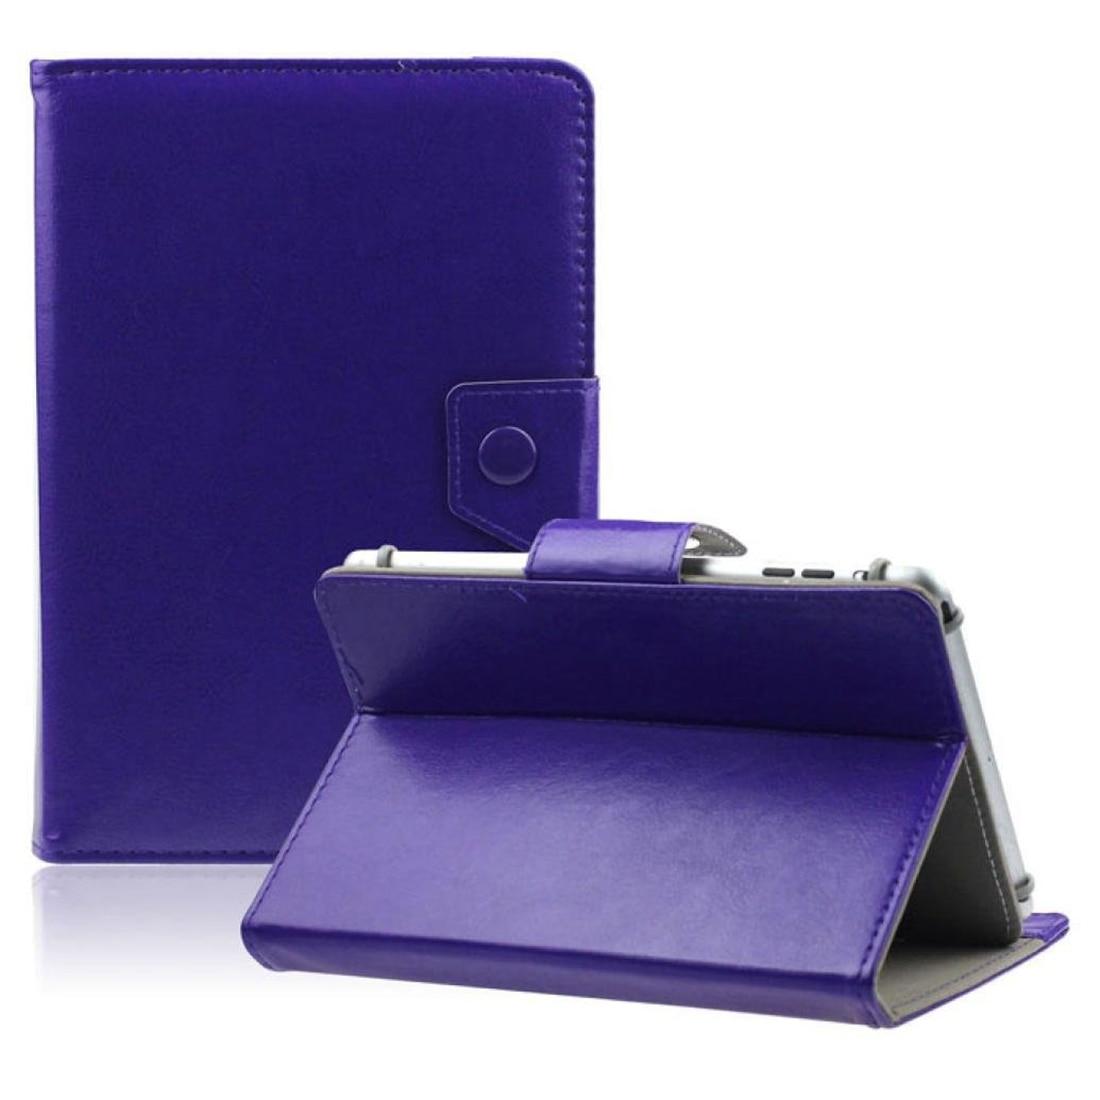 10 Inch Universal Tablet PC Case Crystal PU Leather Support Case (Purple) планшет модель g15 gpad tablet pc в донецке недорого